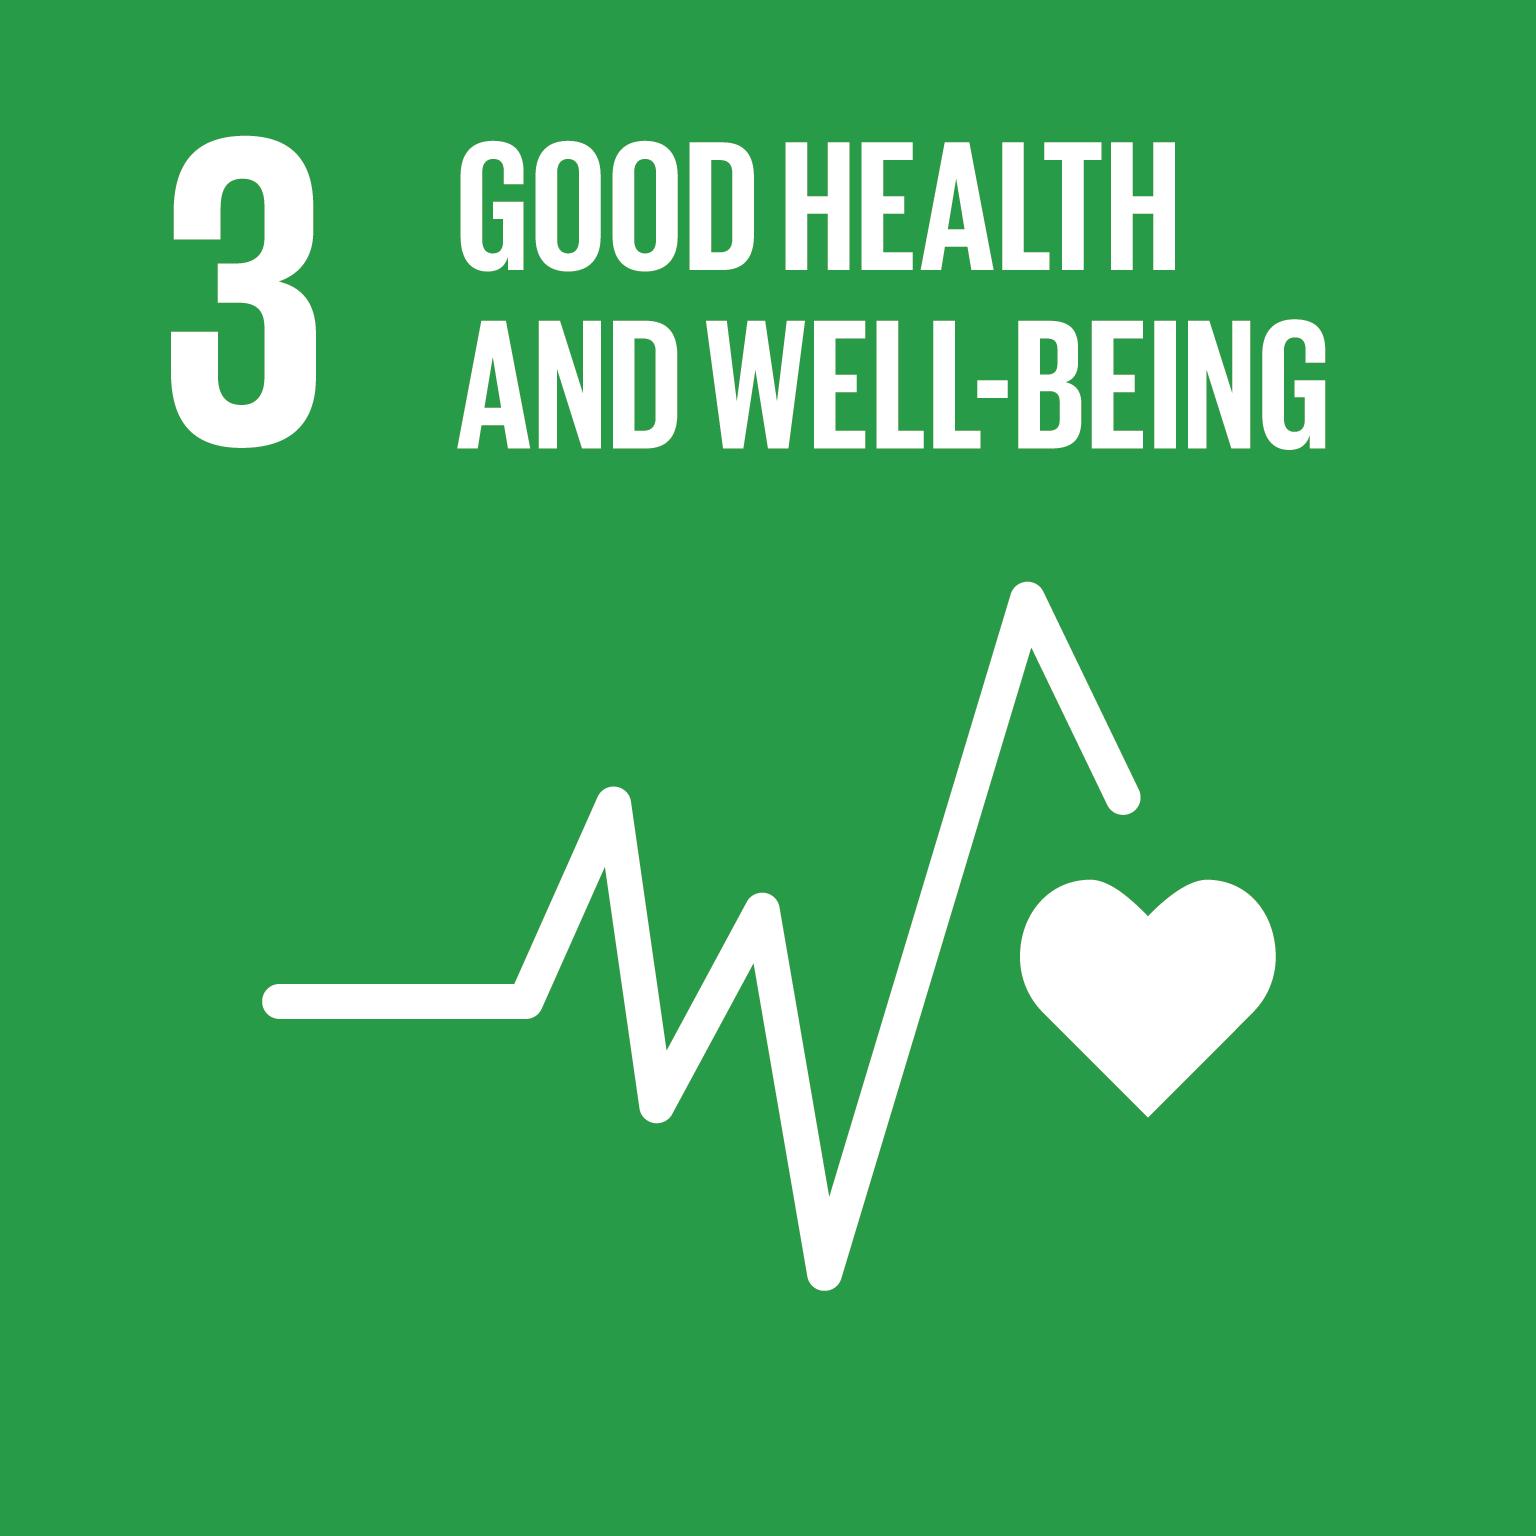 SDG 3 Good Health